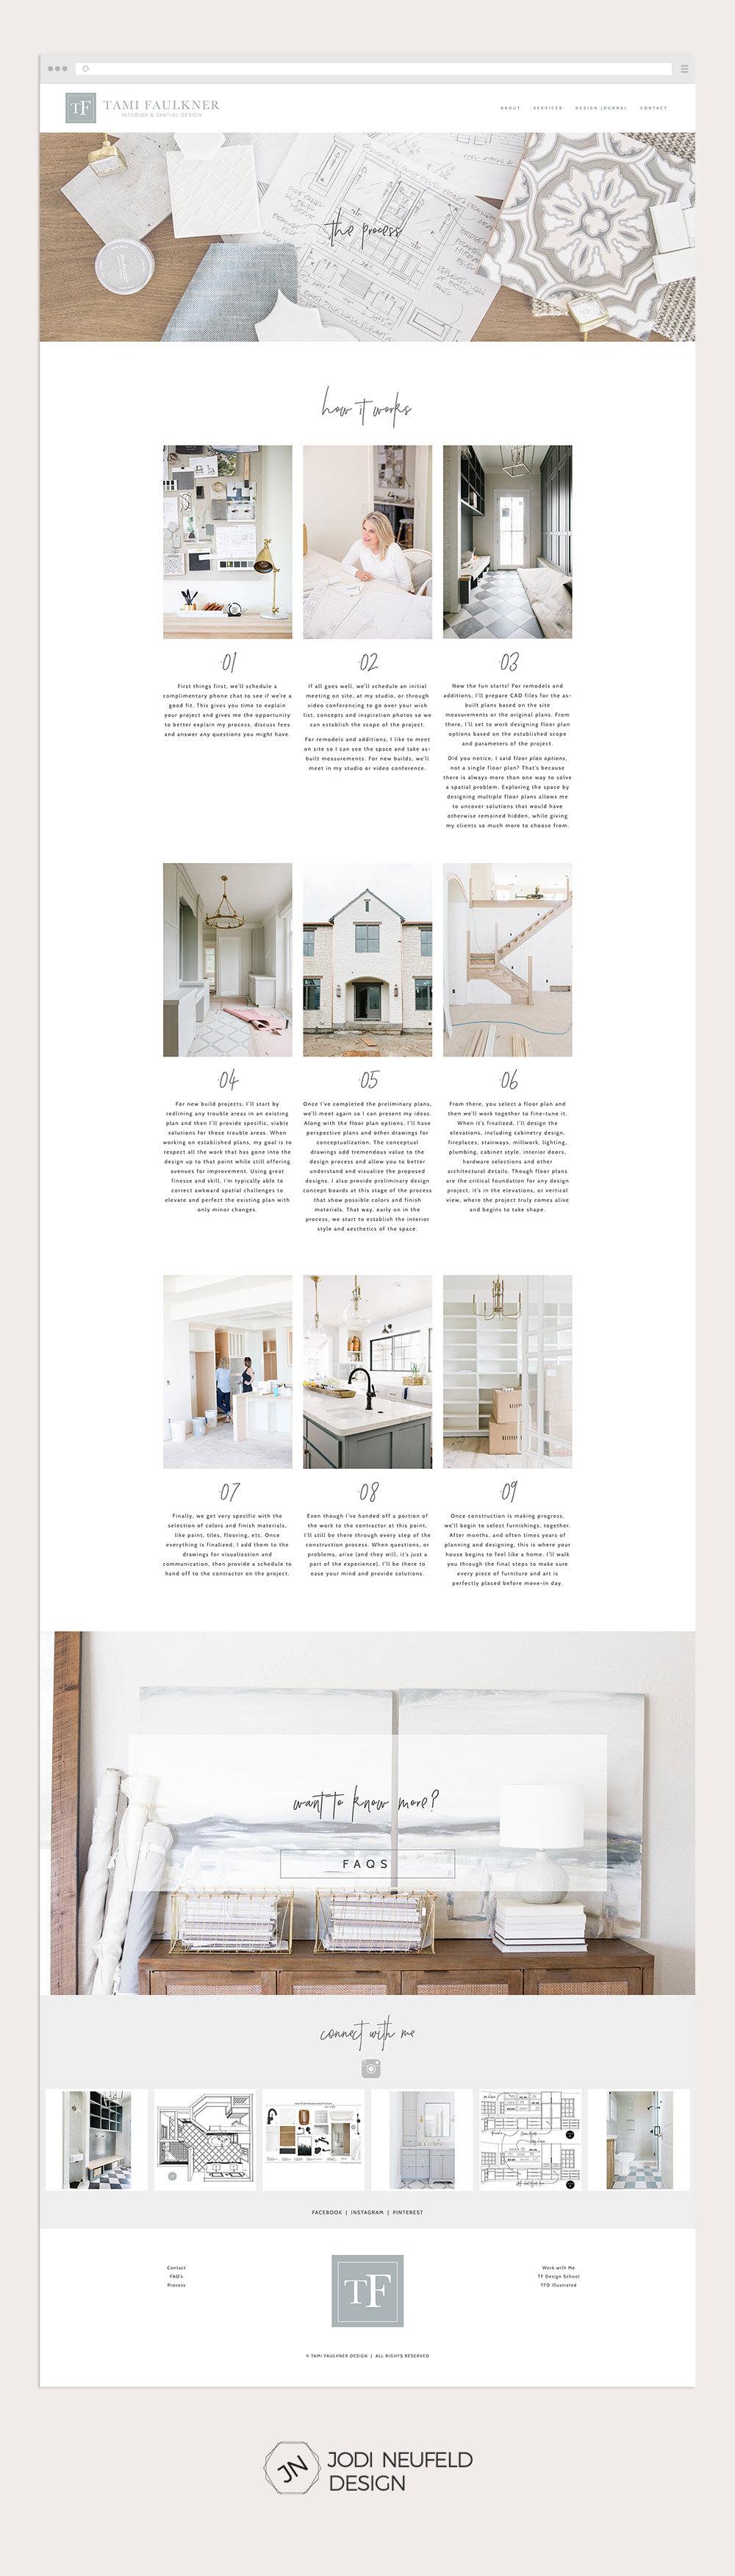 Process page for Tami Faulkner interior designer by Jodi Neufeld Design | Squarespace web designer